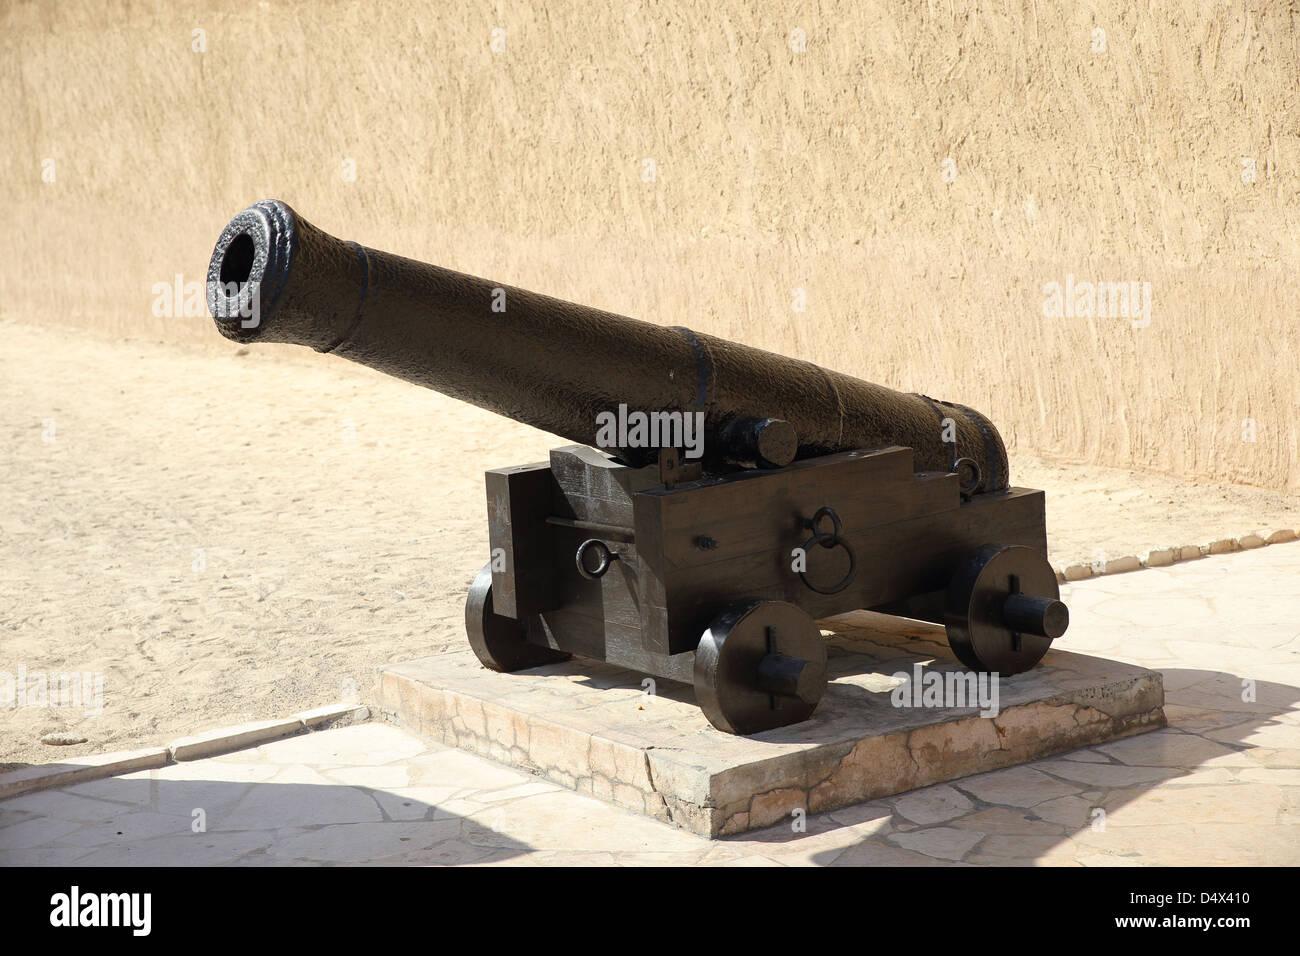 Canon on display at Dubai Museum, Dubai, United Arab Emirates - Stock Image